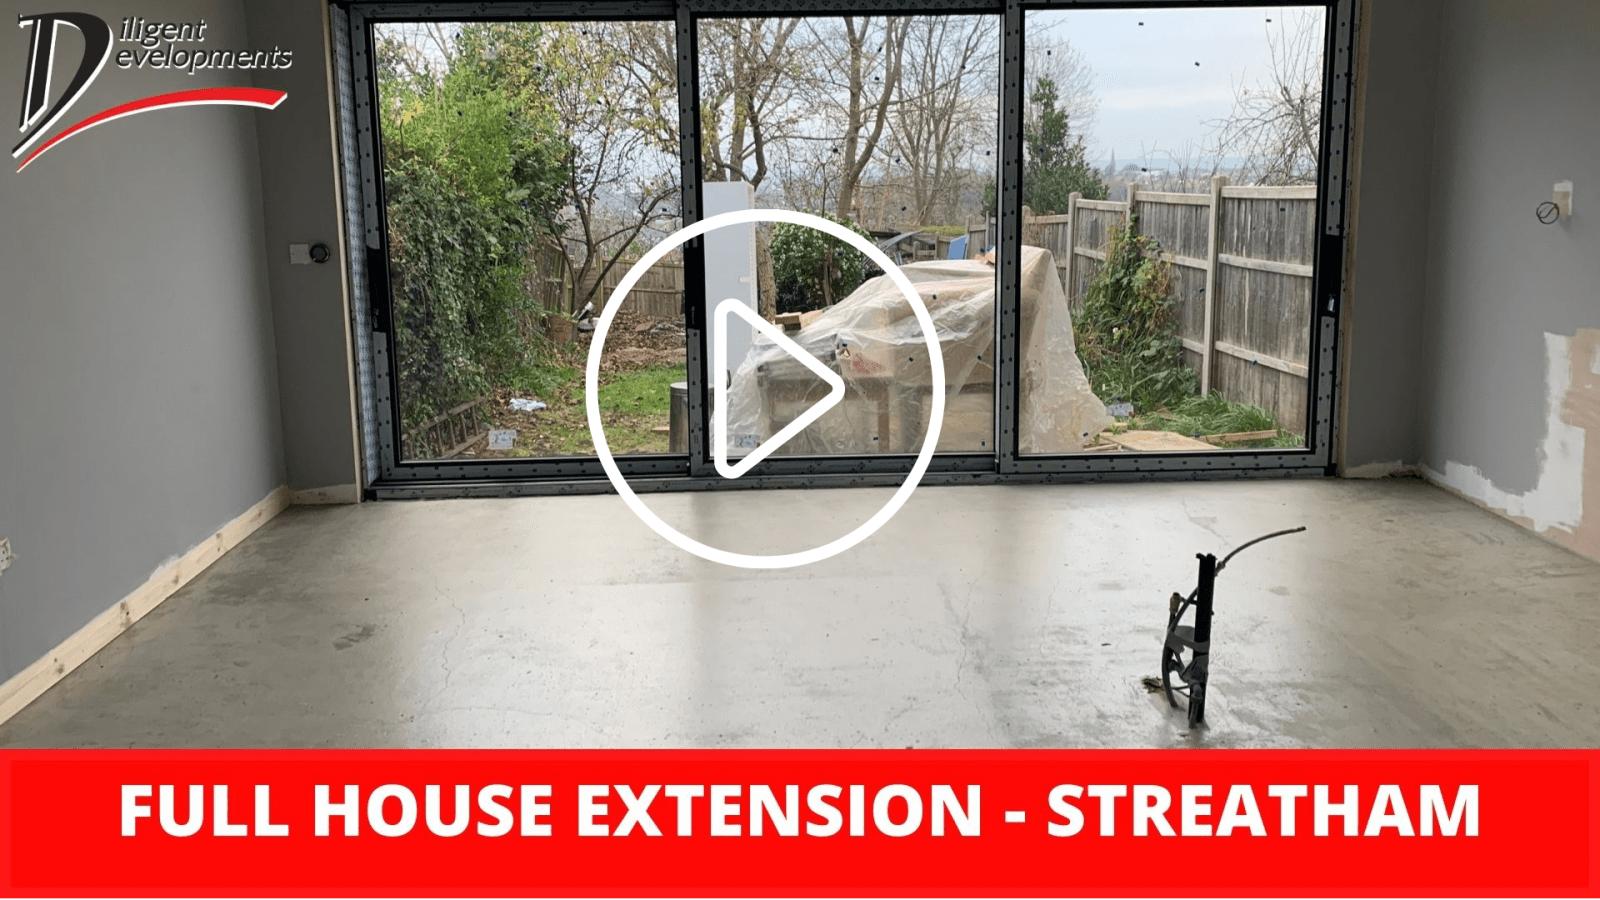 Full Home Extension - Streatham